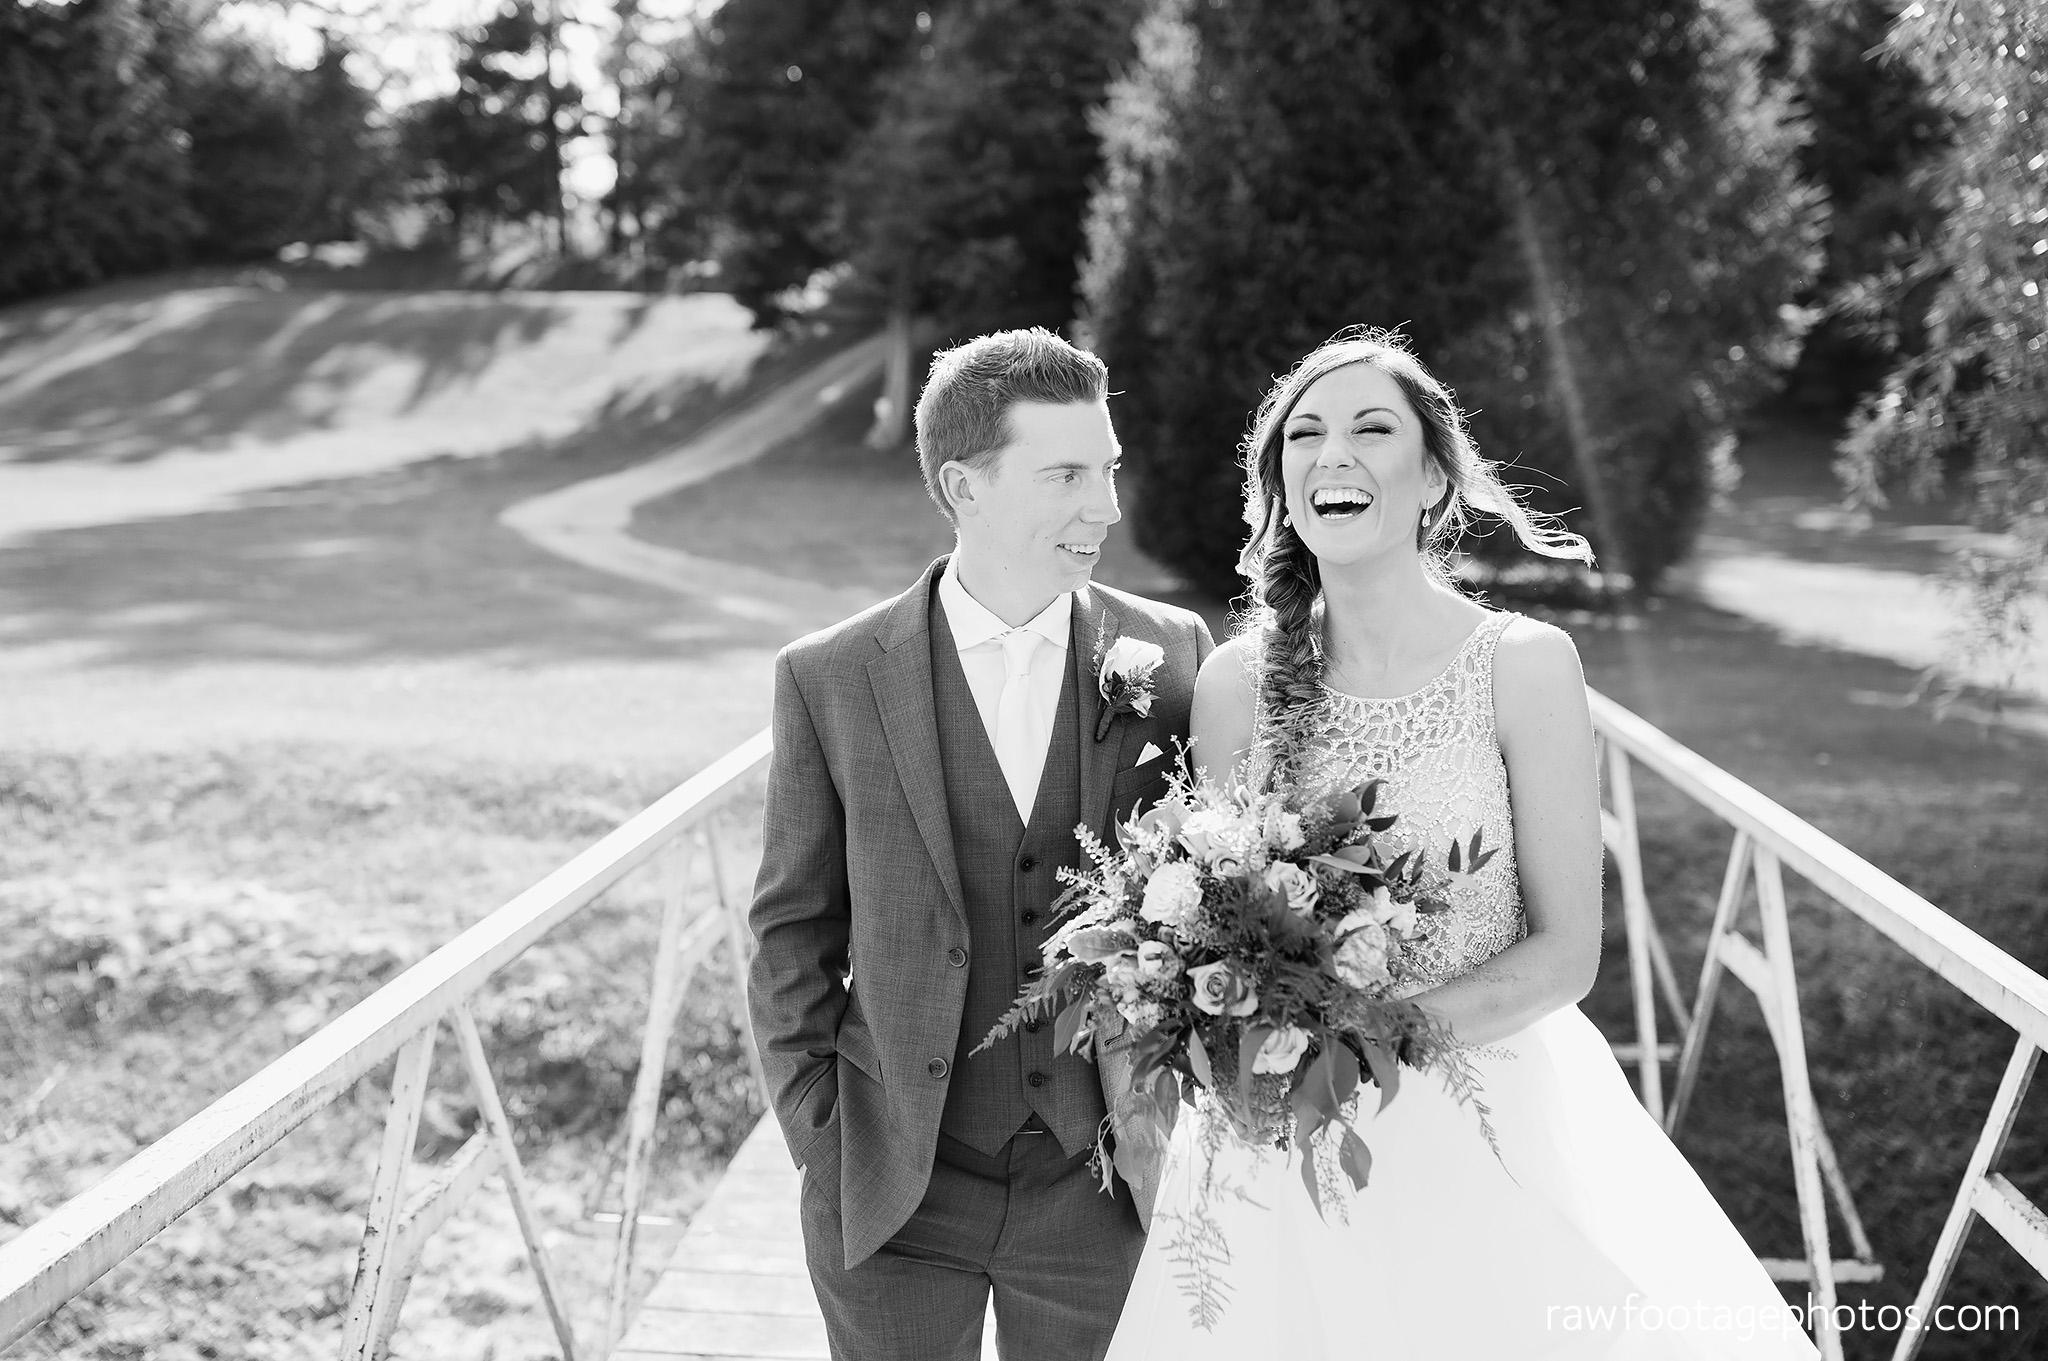 london_ontario_wedding_photographer-grand_bend_wedding_photographer-oakwood_resort_wedding-beach_wedding-sunset_wedding-raw_footage_photography046.jpg